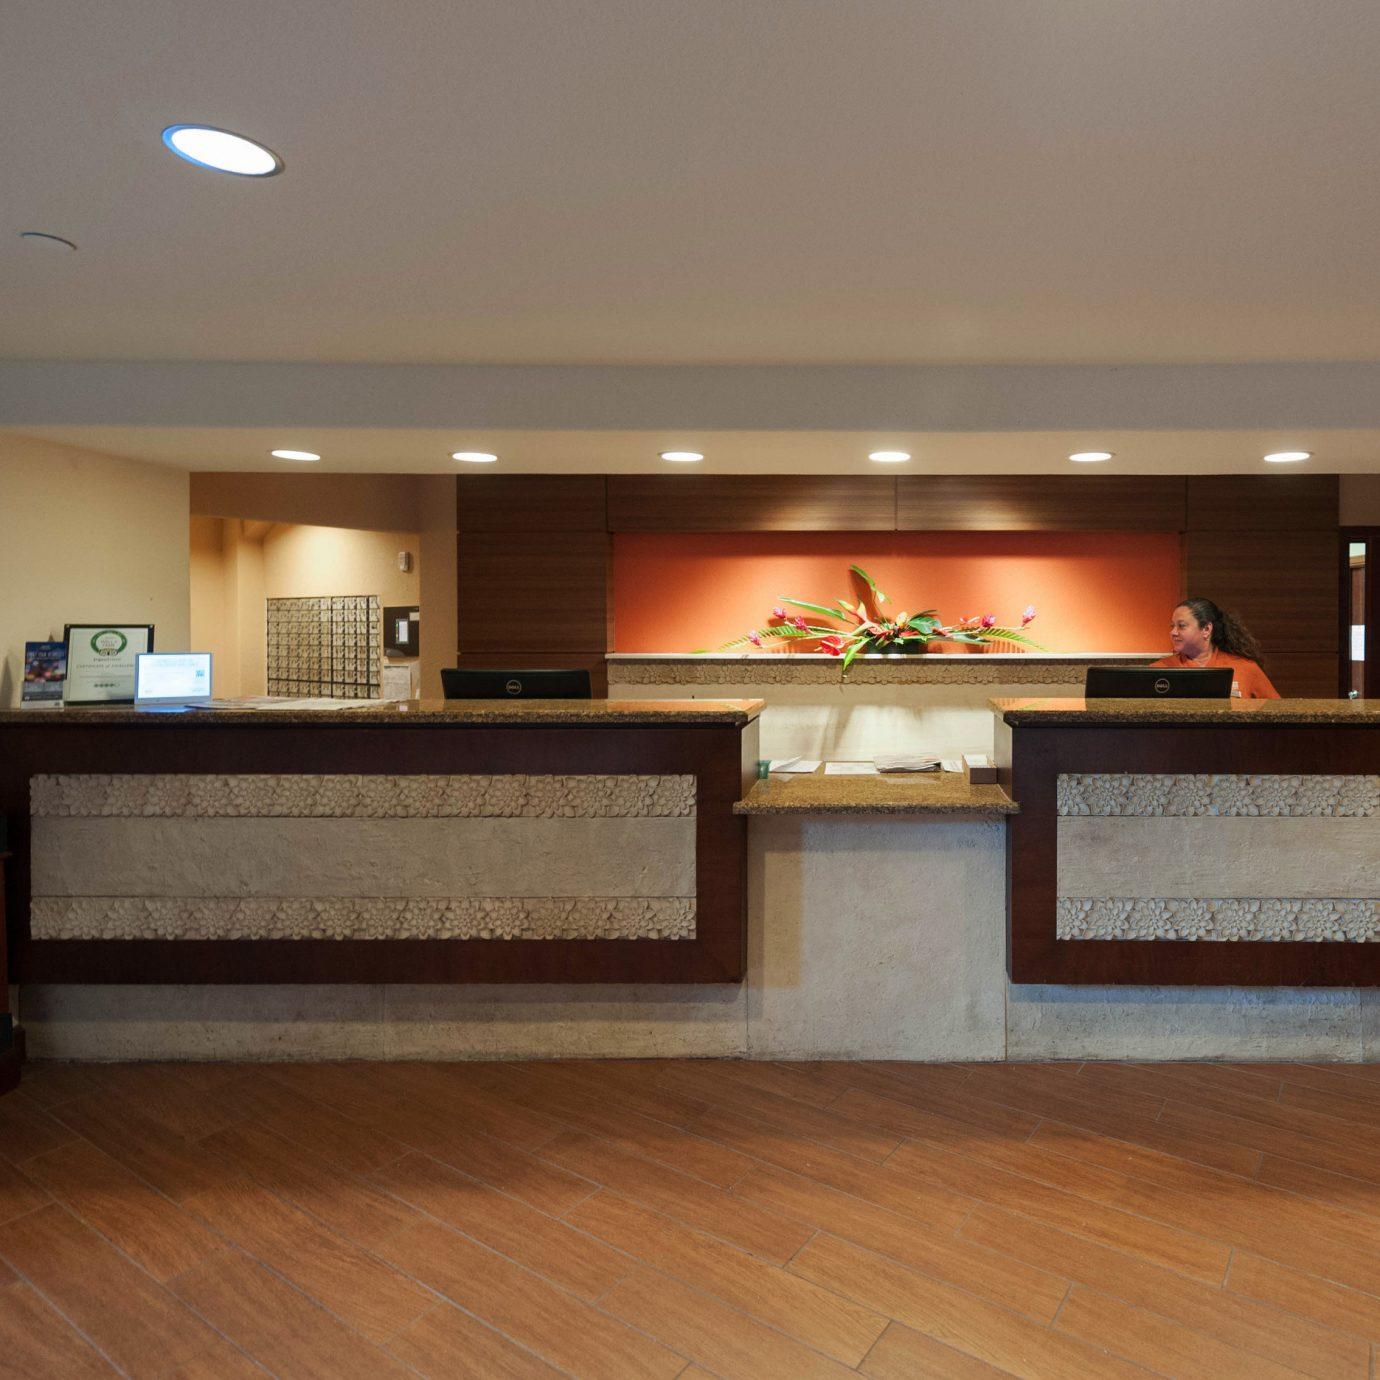 property hardwood Lobby living room home cabinetry wood flooring flooring recreation room